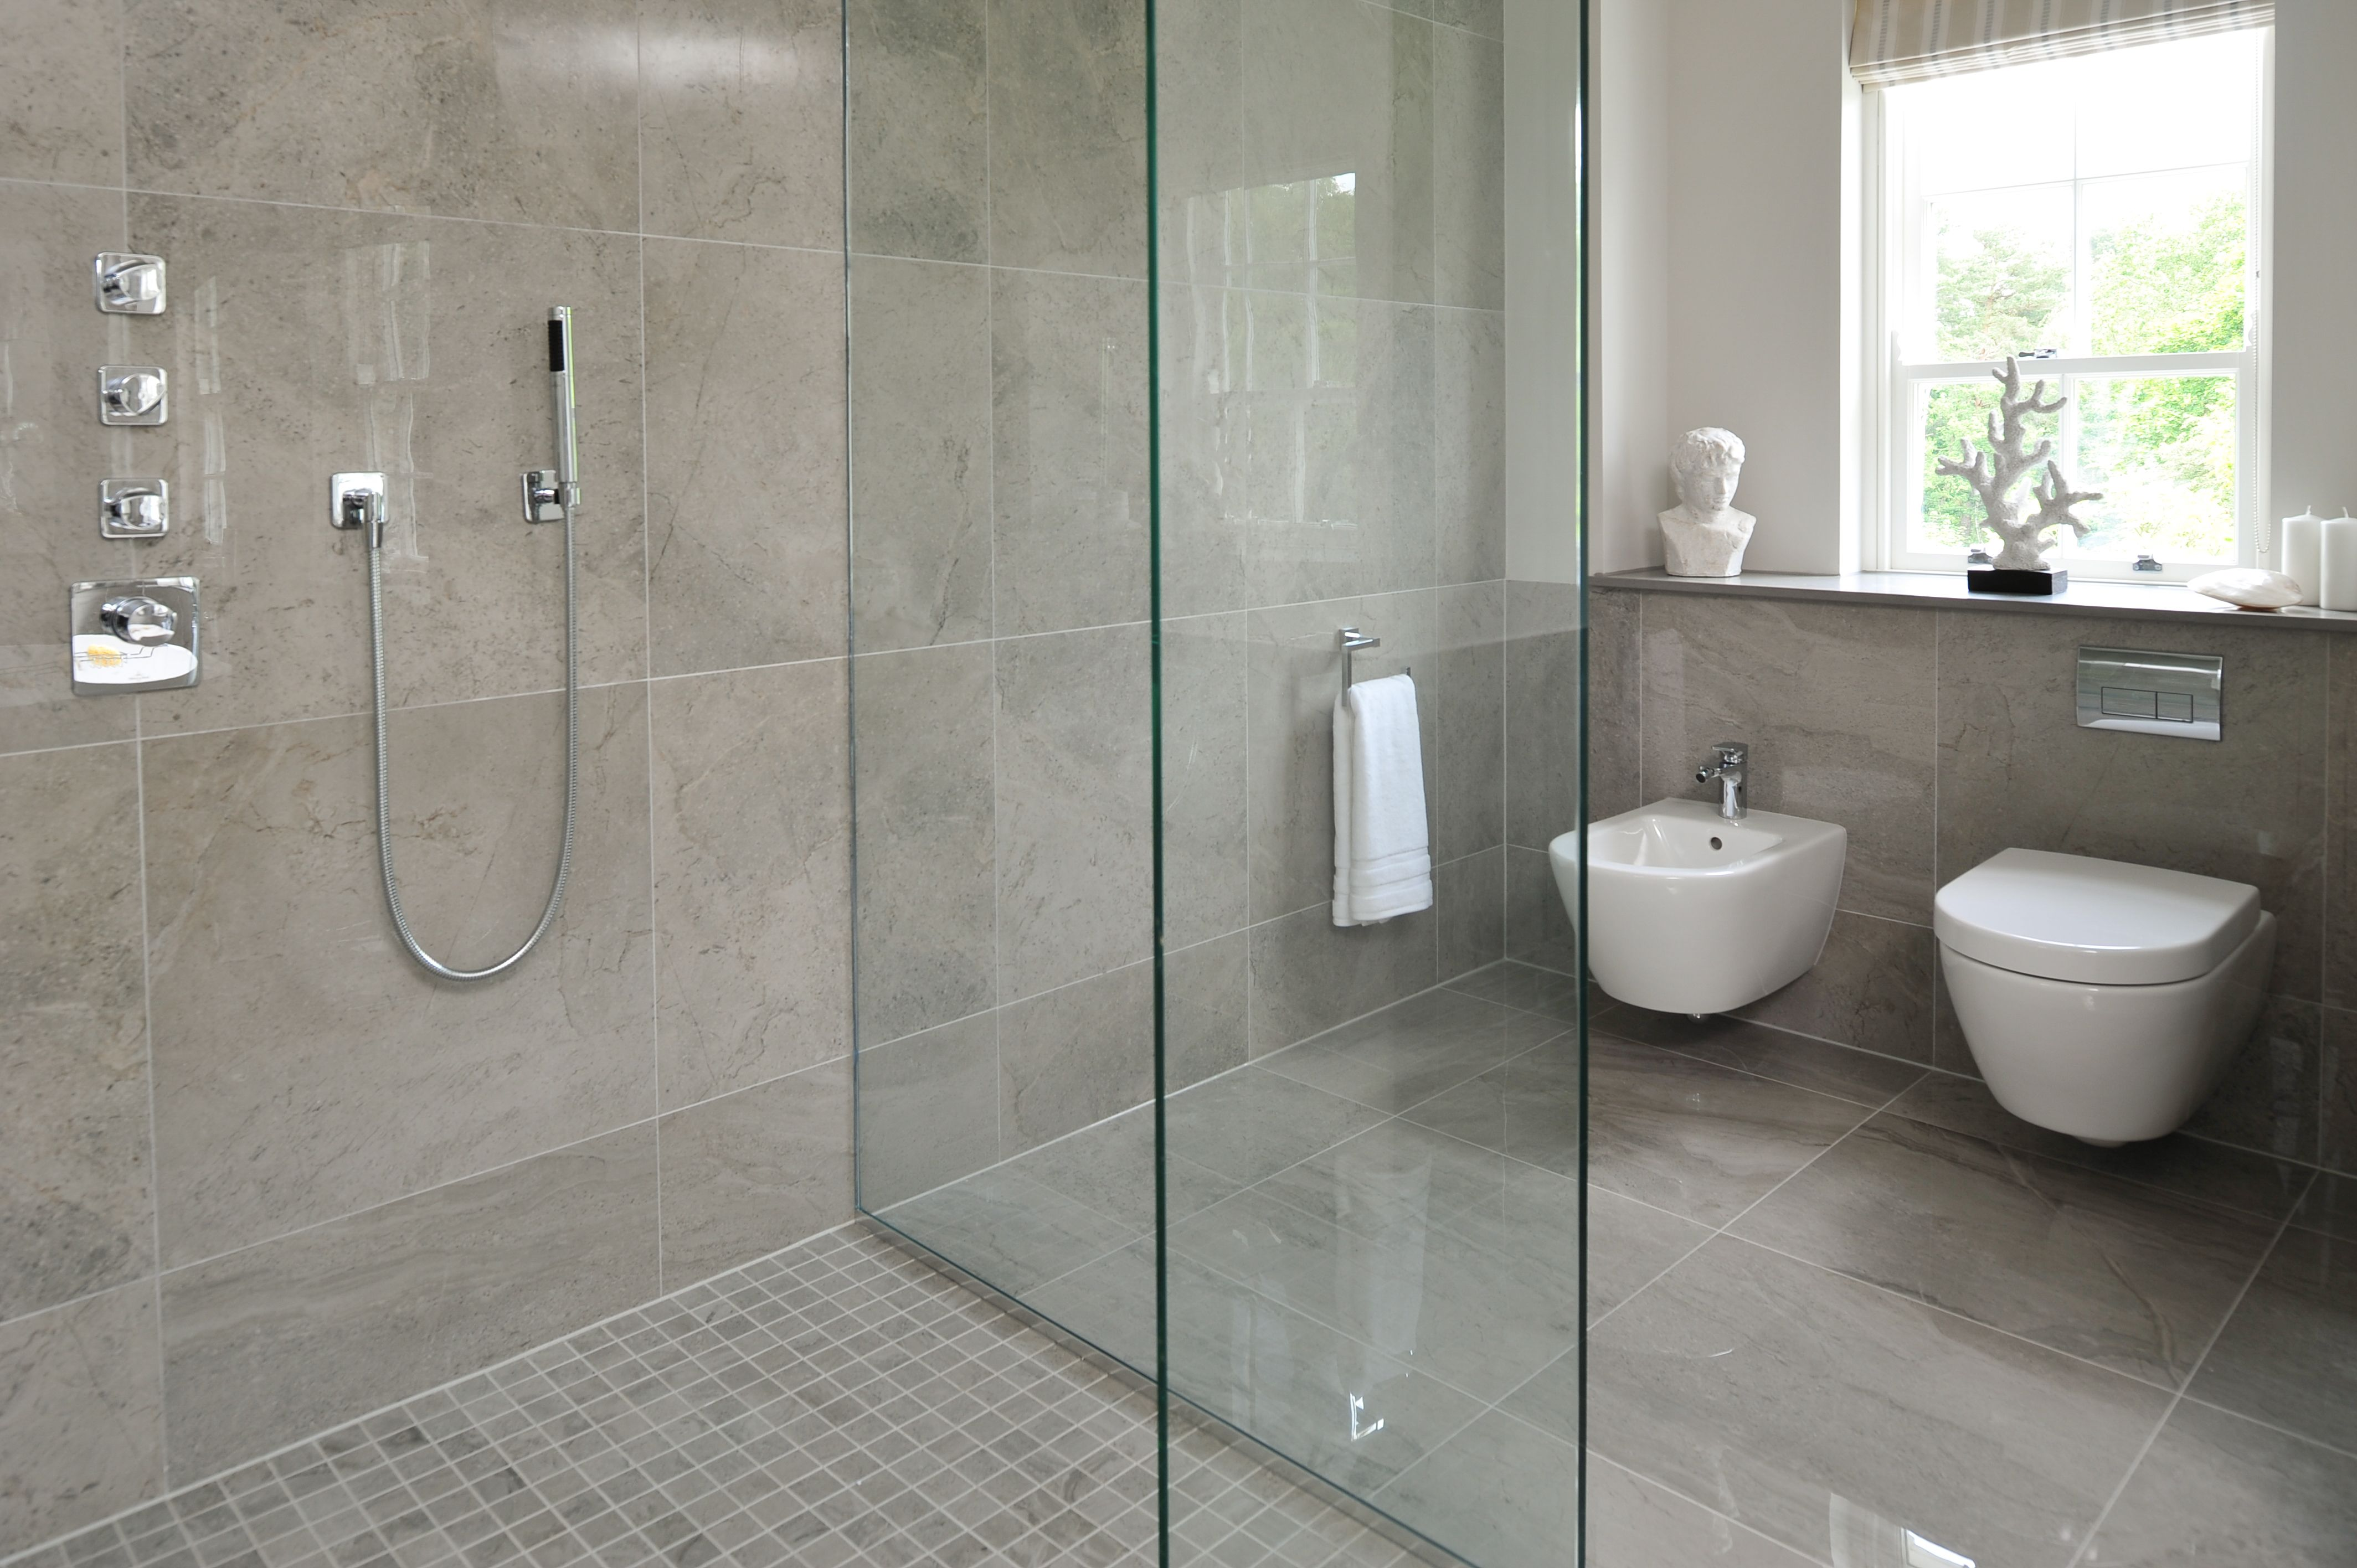 Minoli Gotha Floor Tiles Gotha Platinum Lux 59 x 59